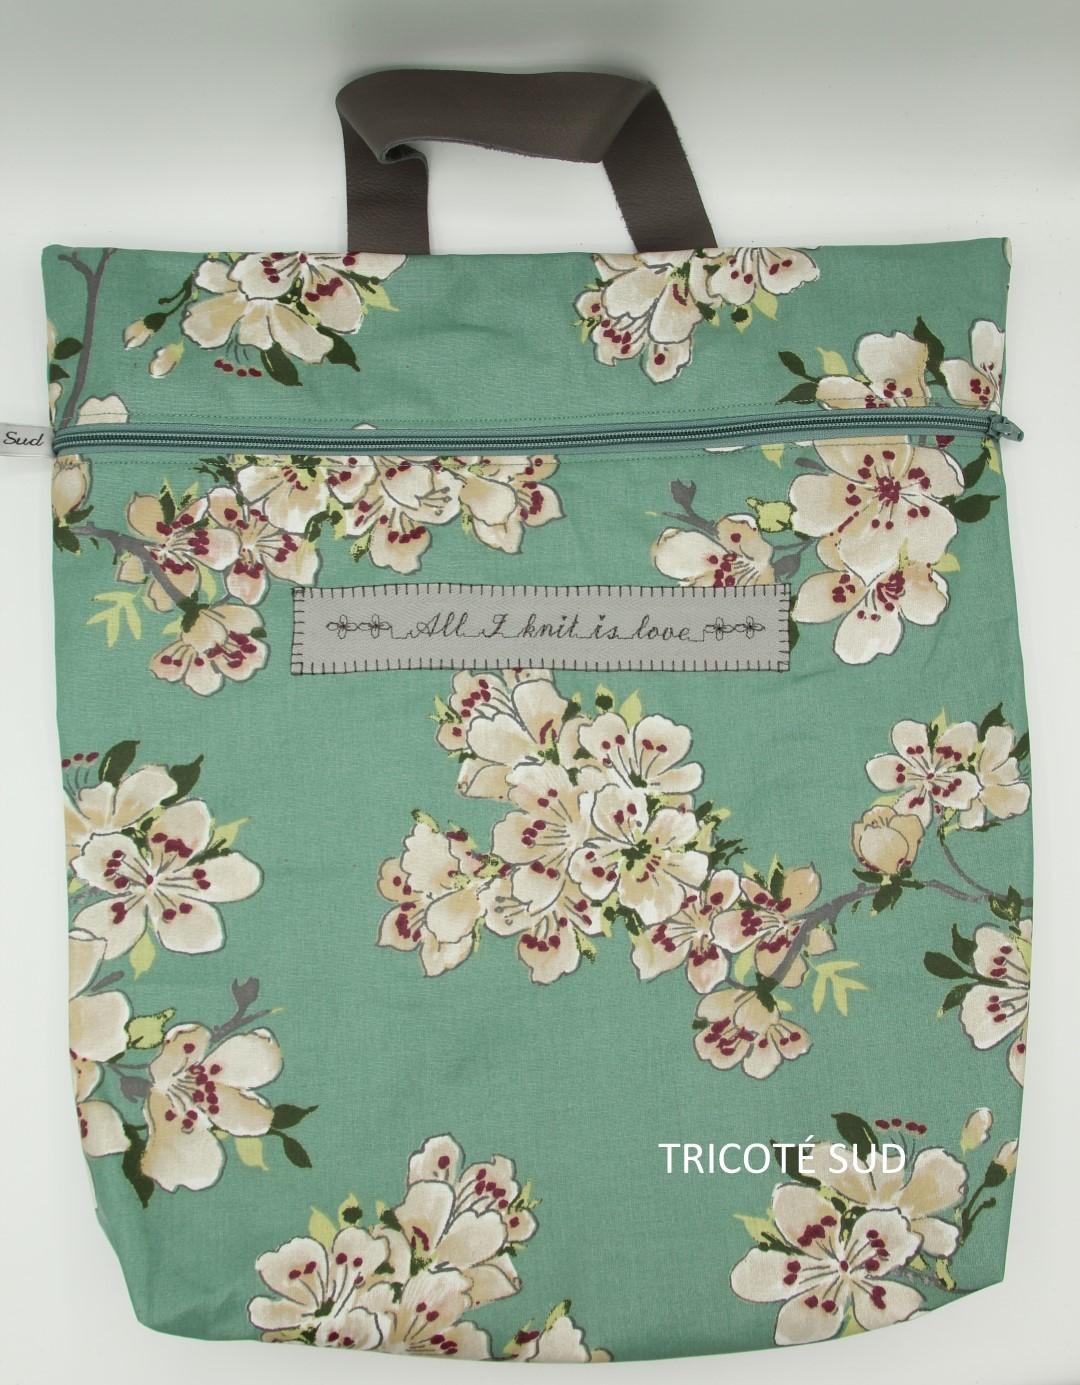 TRICOSAC 21-016 (1) (Large)